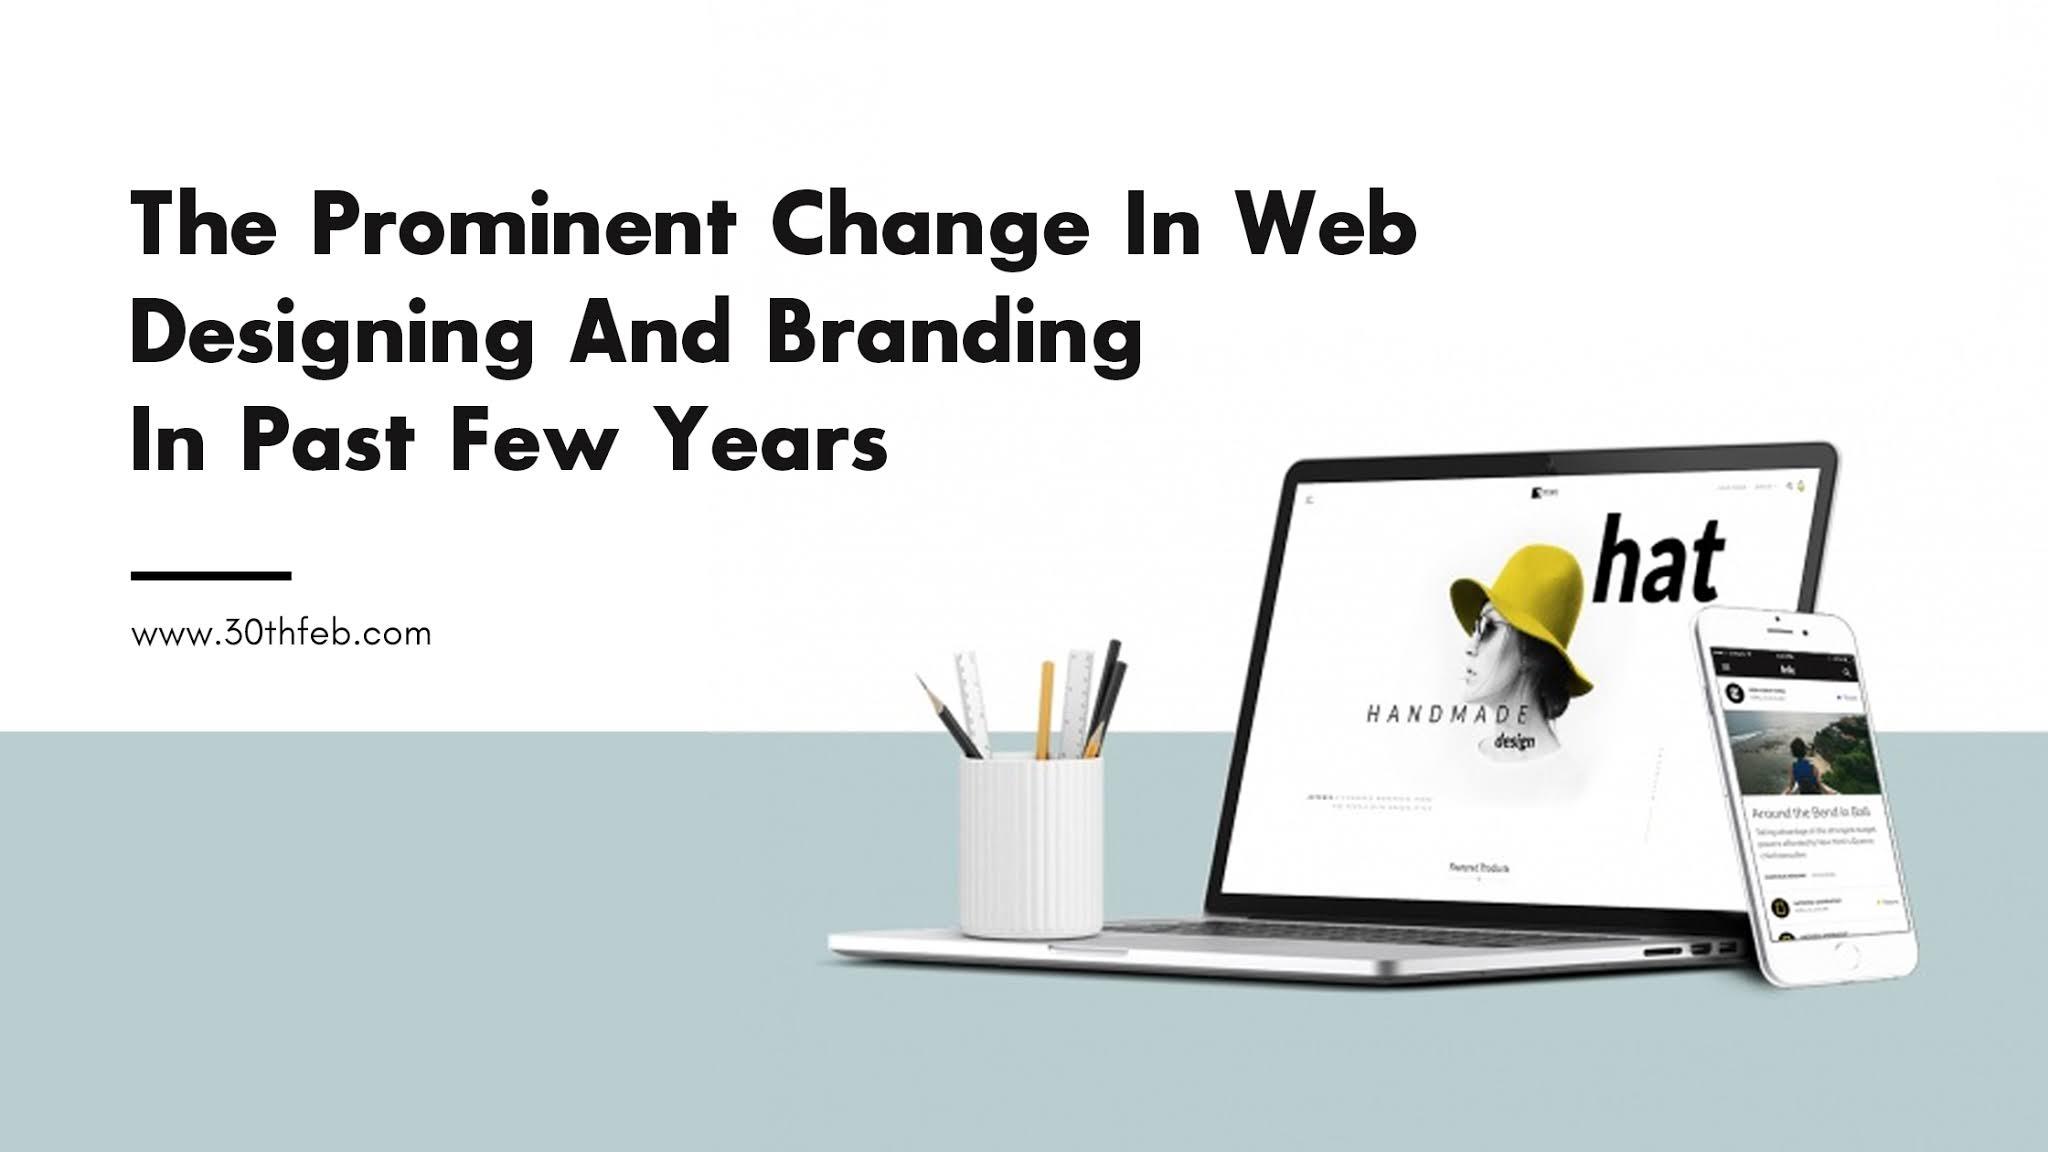 Web Designing And Branding